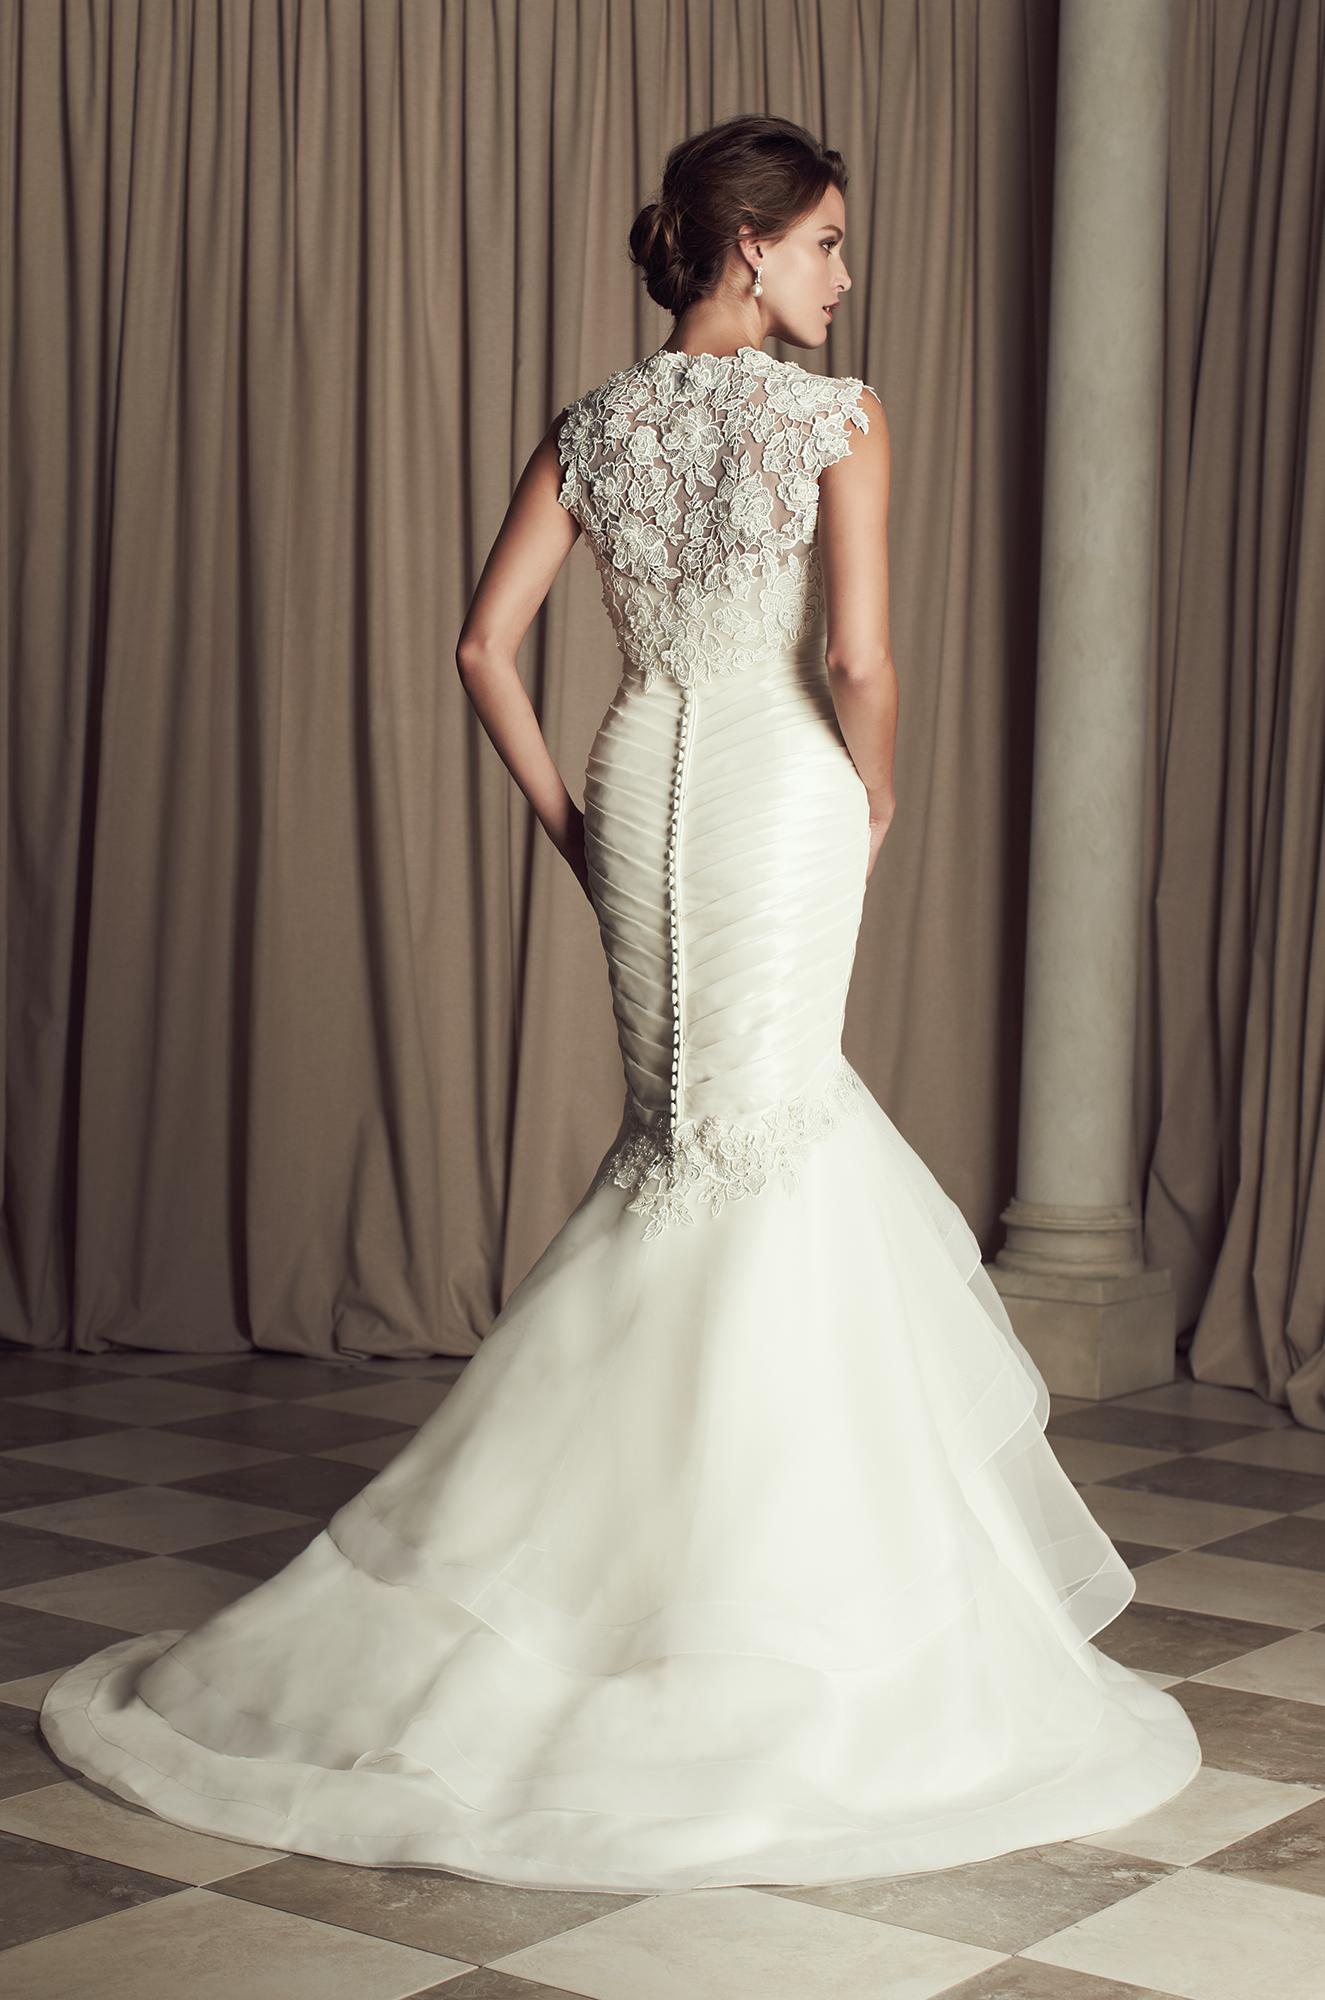 The Back View Of A Stunning Dress By Paloma Blanca Wedding Dresses 2017 Modwedding